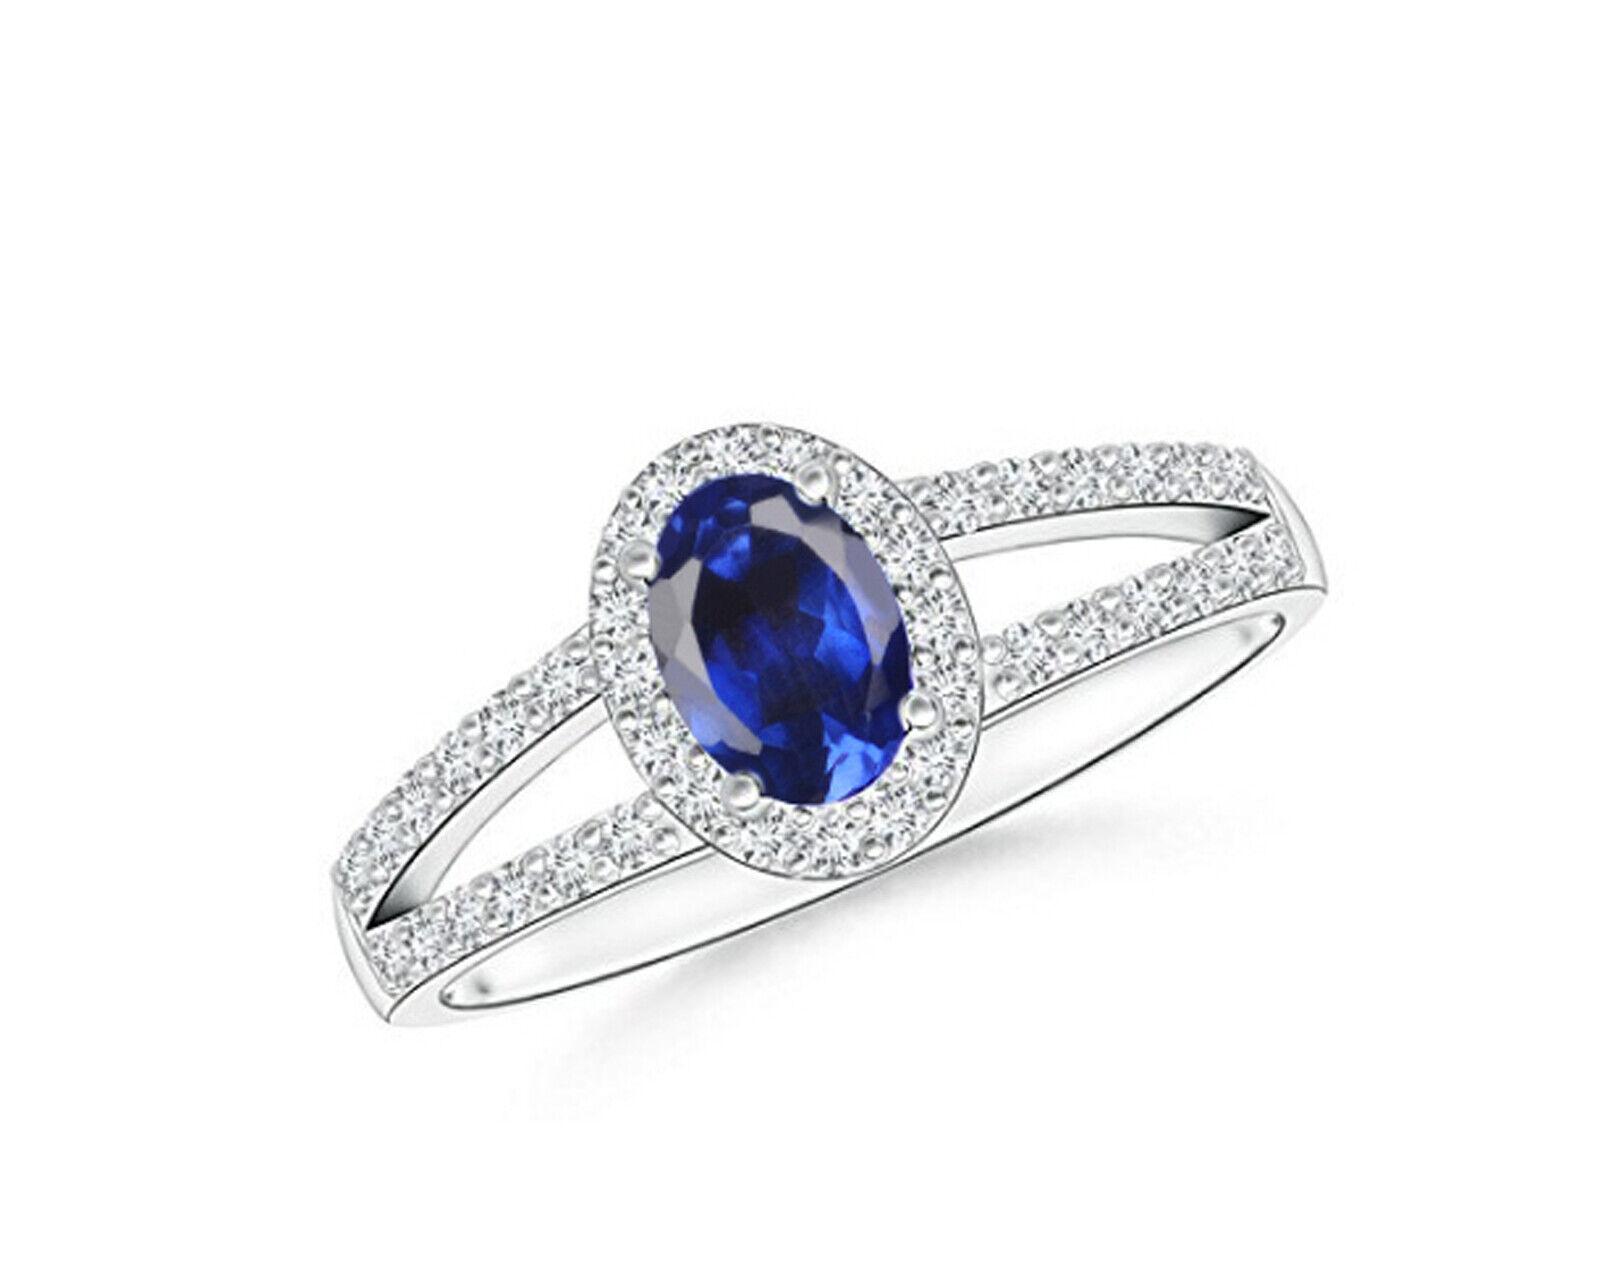 f7590993169e 14KT White gold 1.75Ct Natural blueee EGL Certified Wedding Ring Tanzanite  Diamond nutsma9081-Diamond